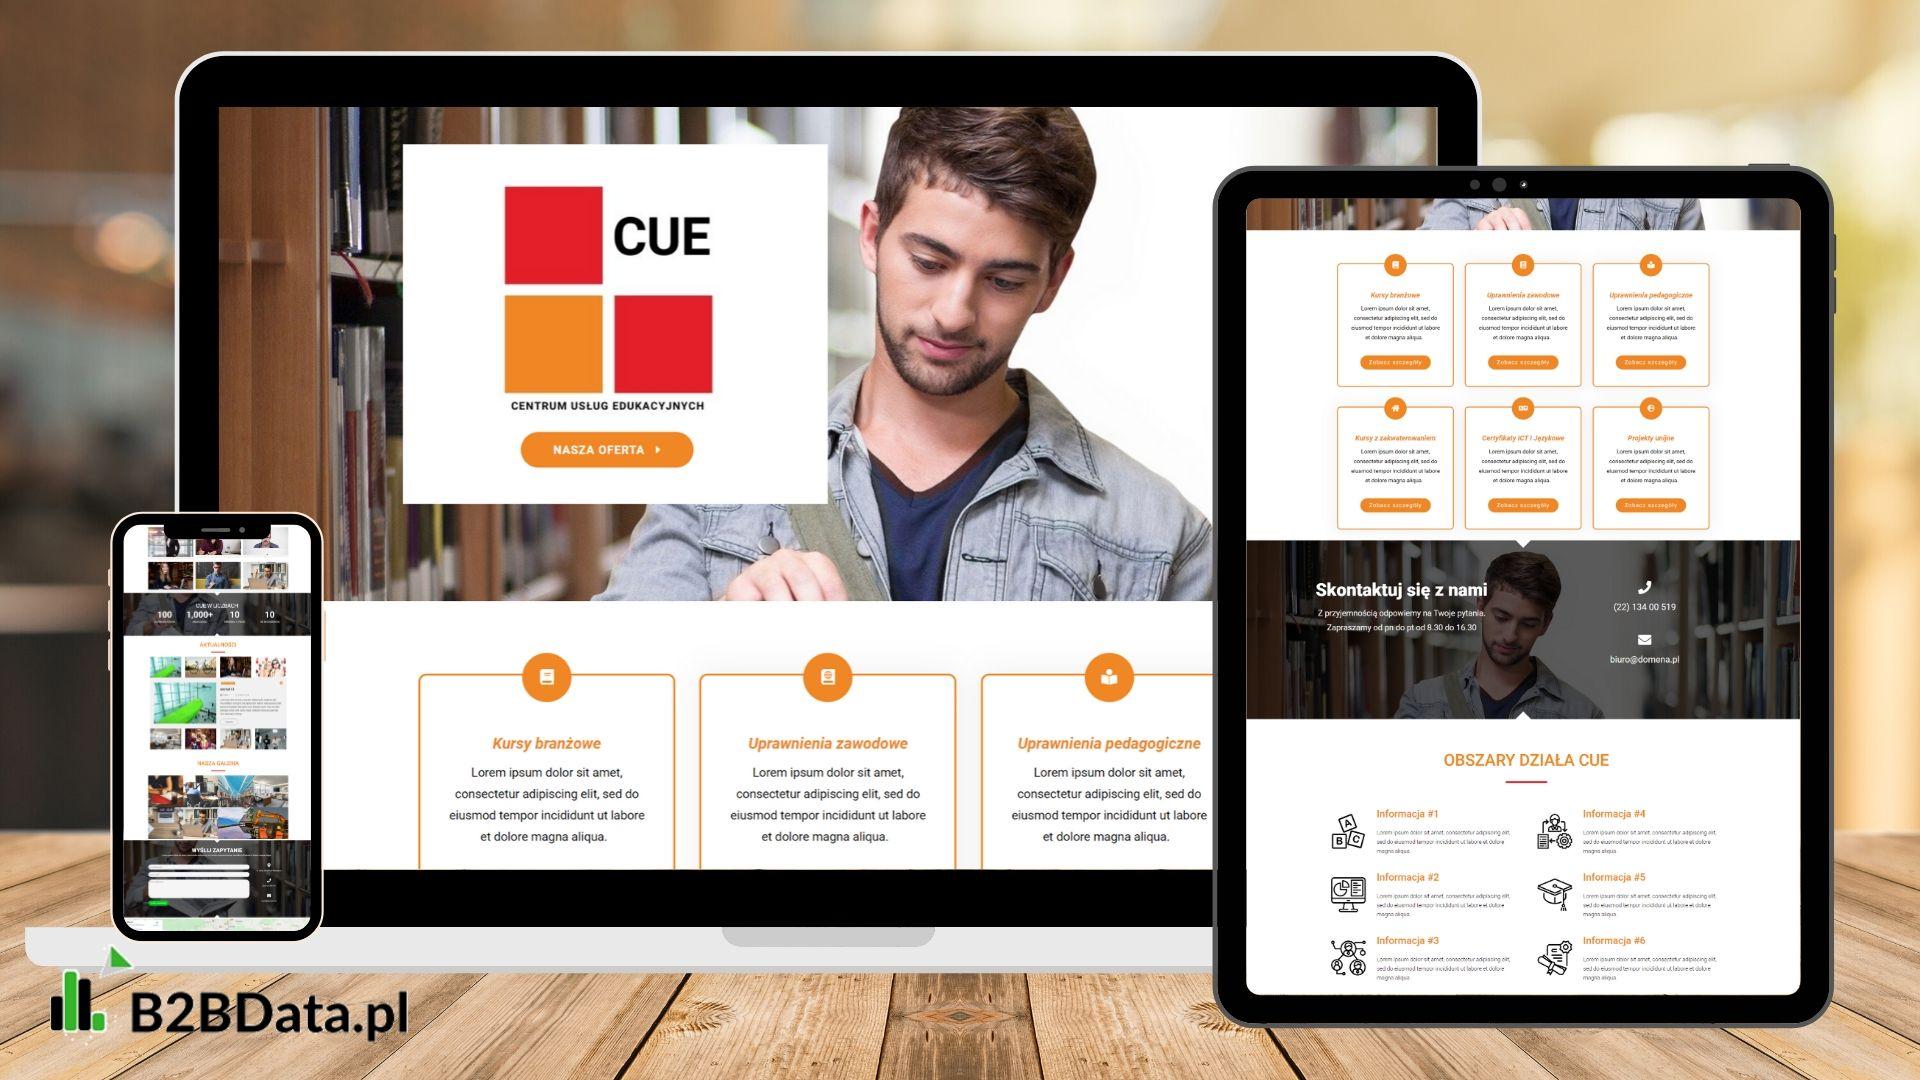 edukacja1 screen 1 - Home